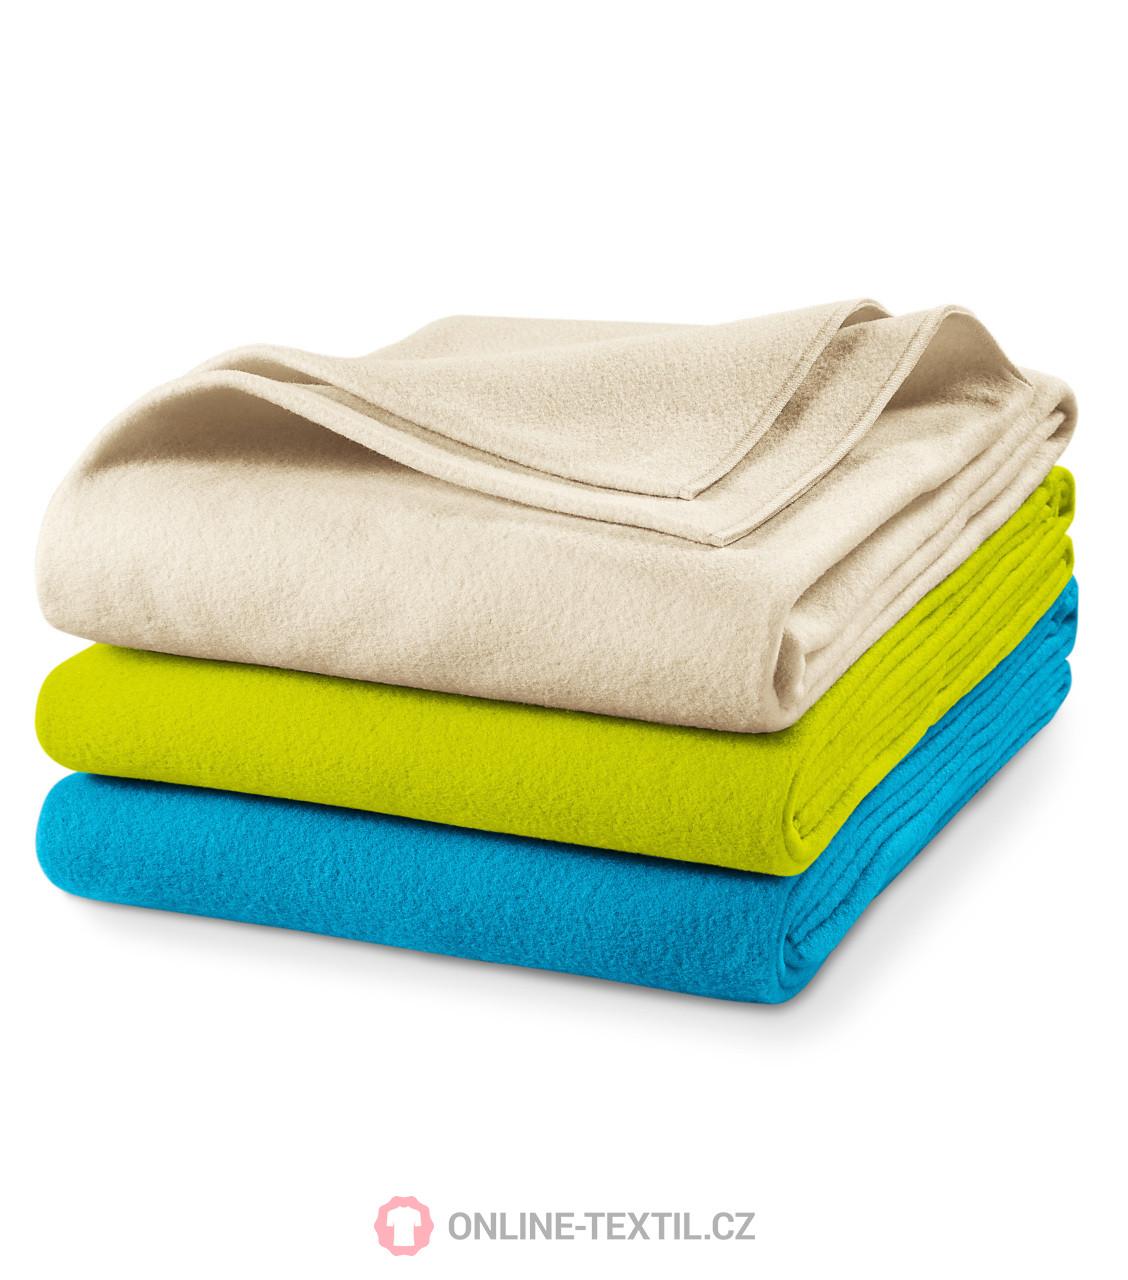 adler czech blanky fleece blanket unisex p94 yellow from the